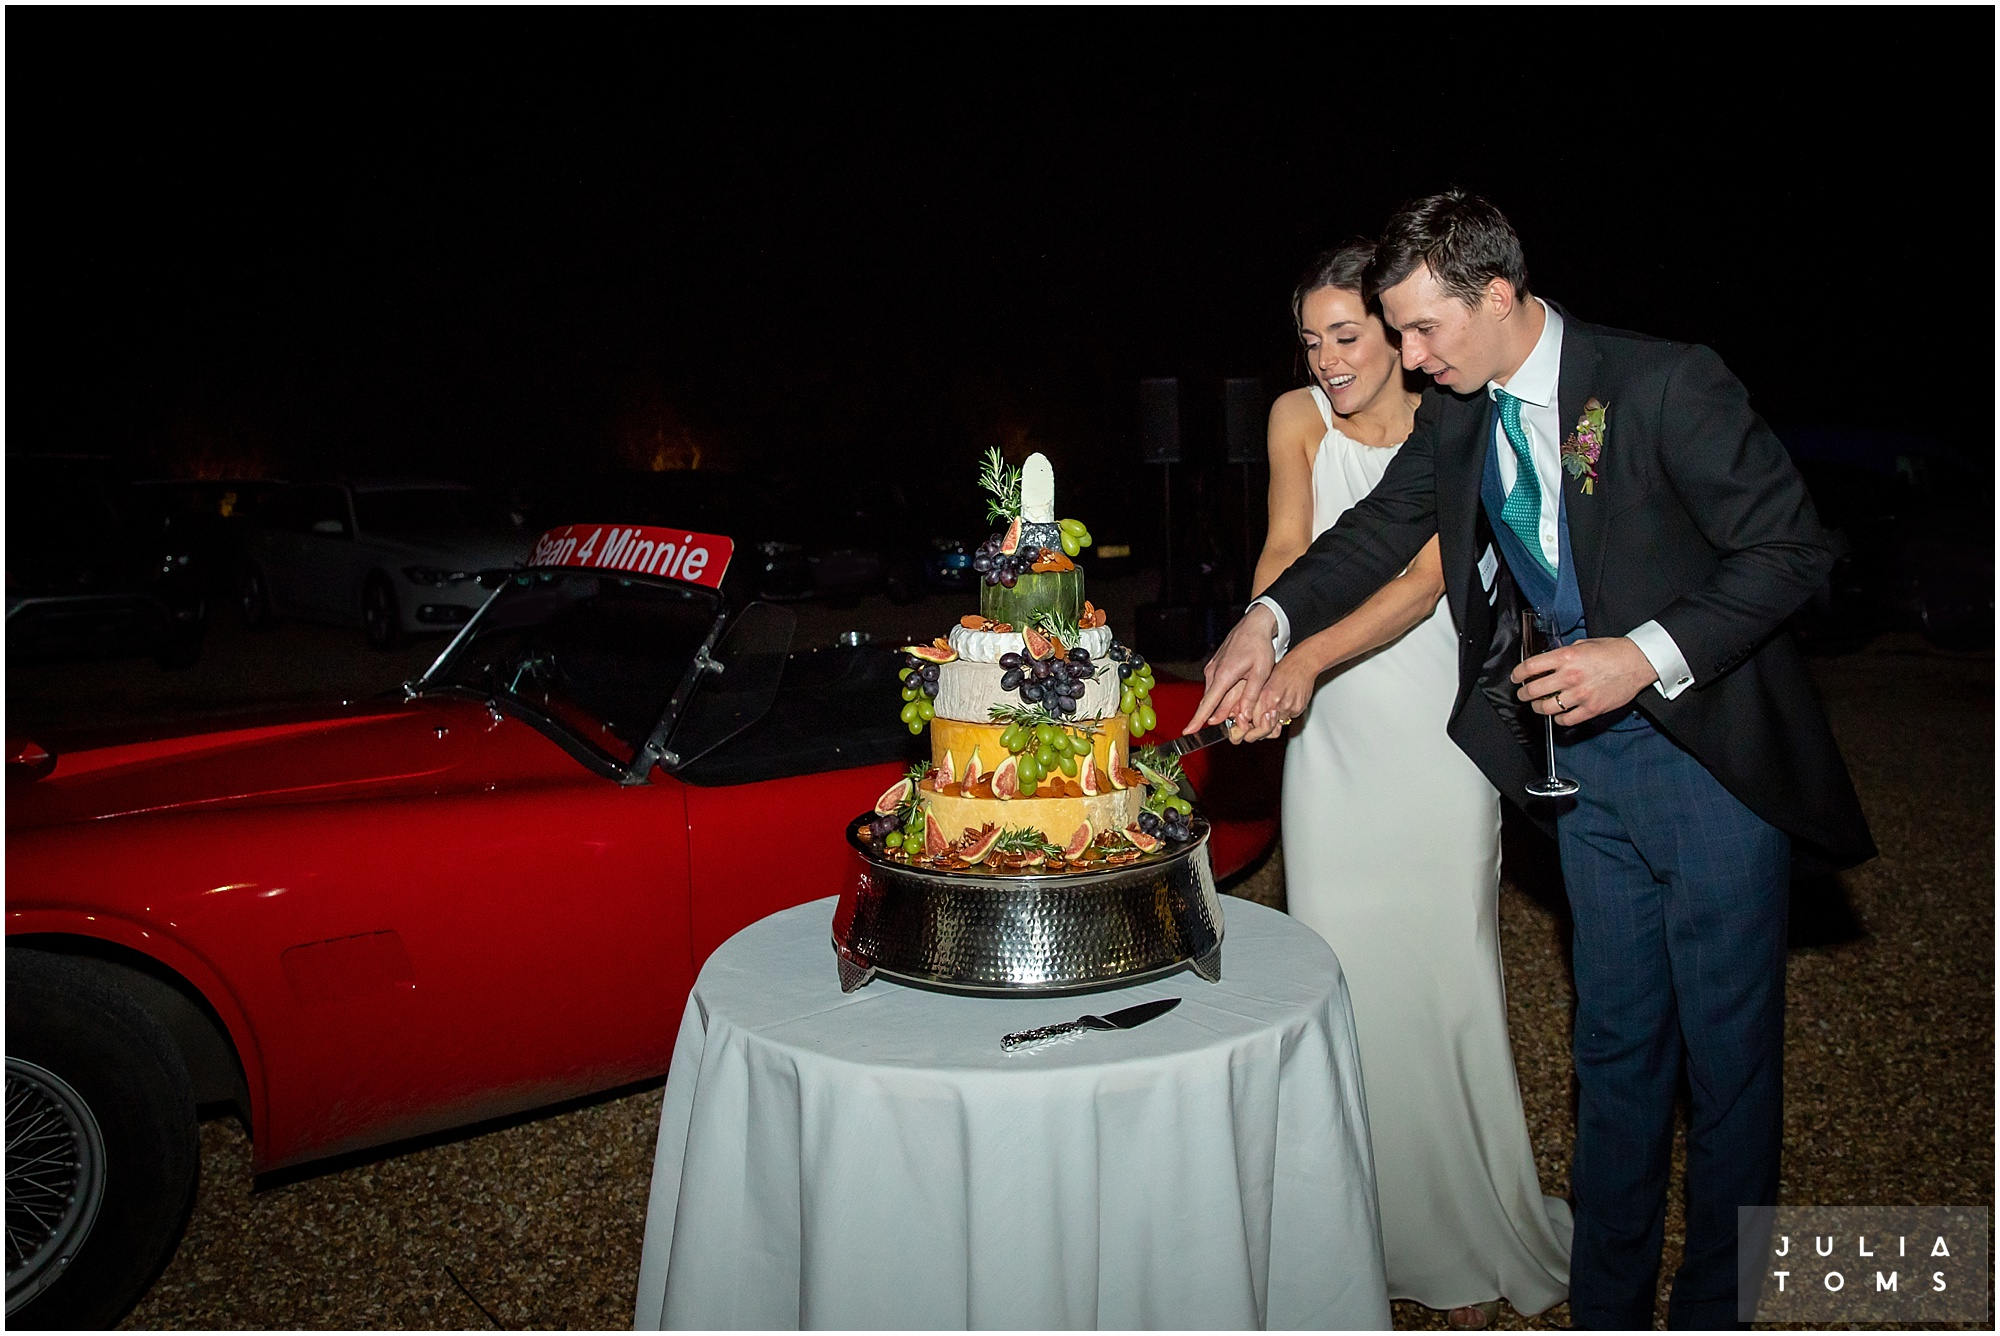 Southend_barn_wedding_photographer_juliatoms_020.jpg